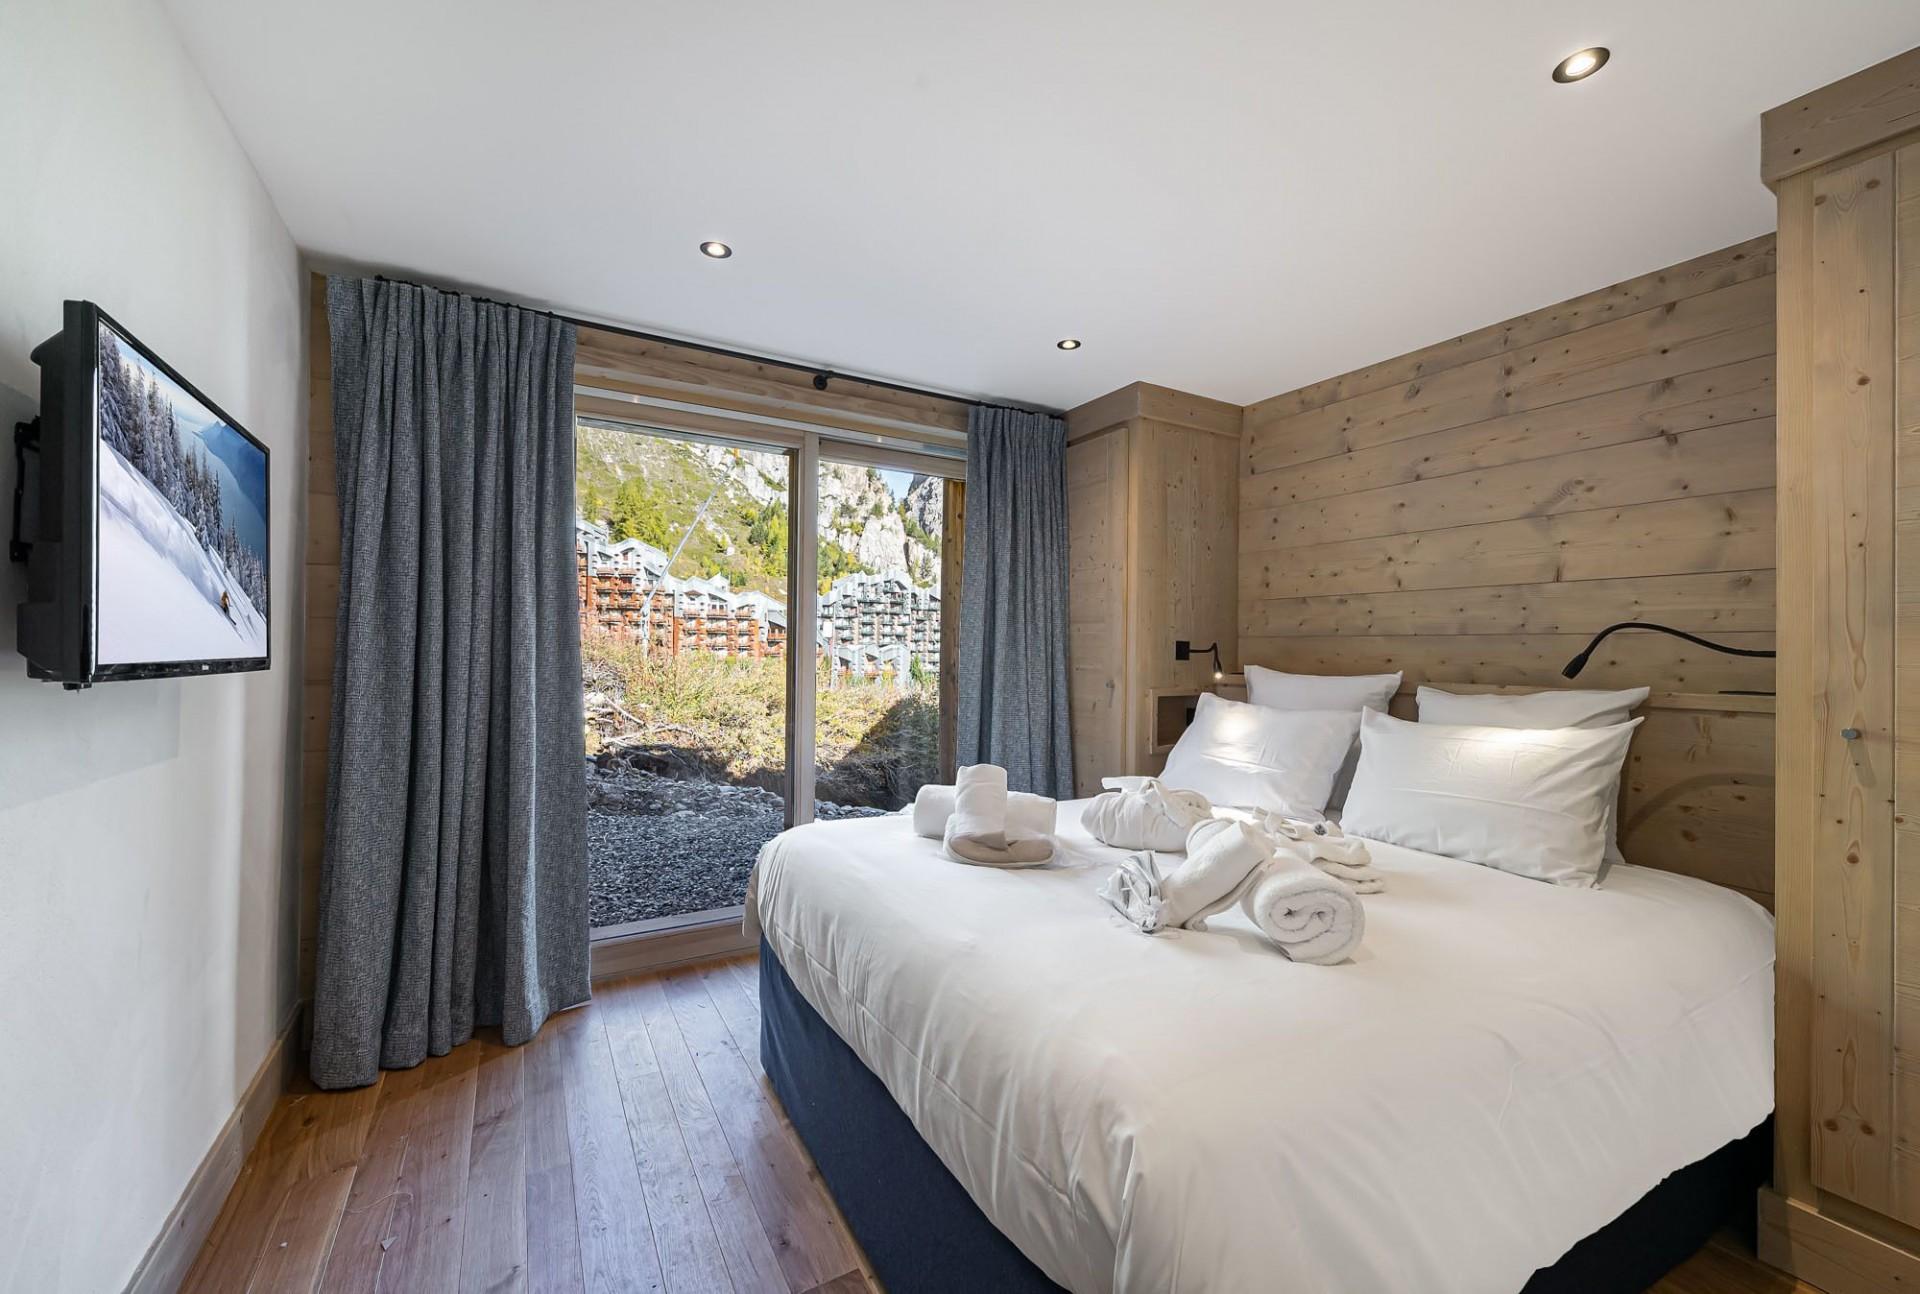 Val d'Isère Luxury Rental Chalet Eclaito Bedroom 4